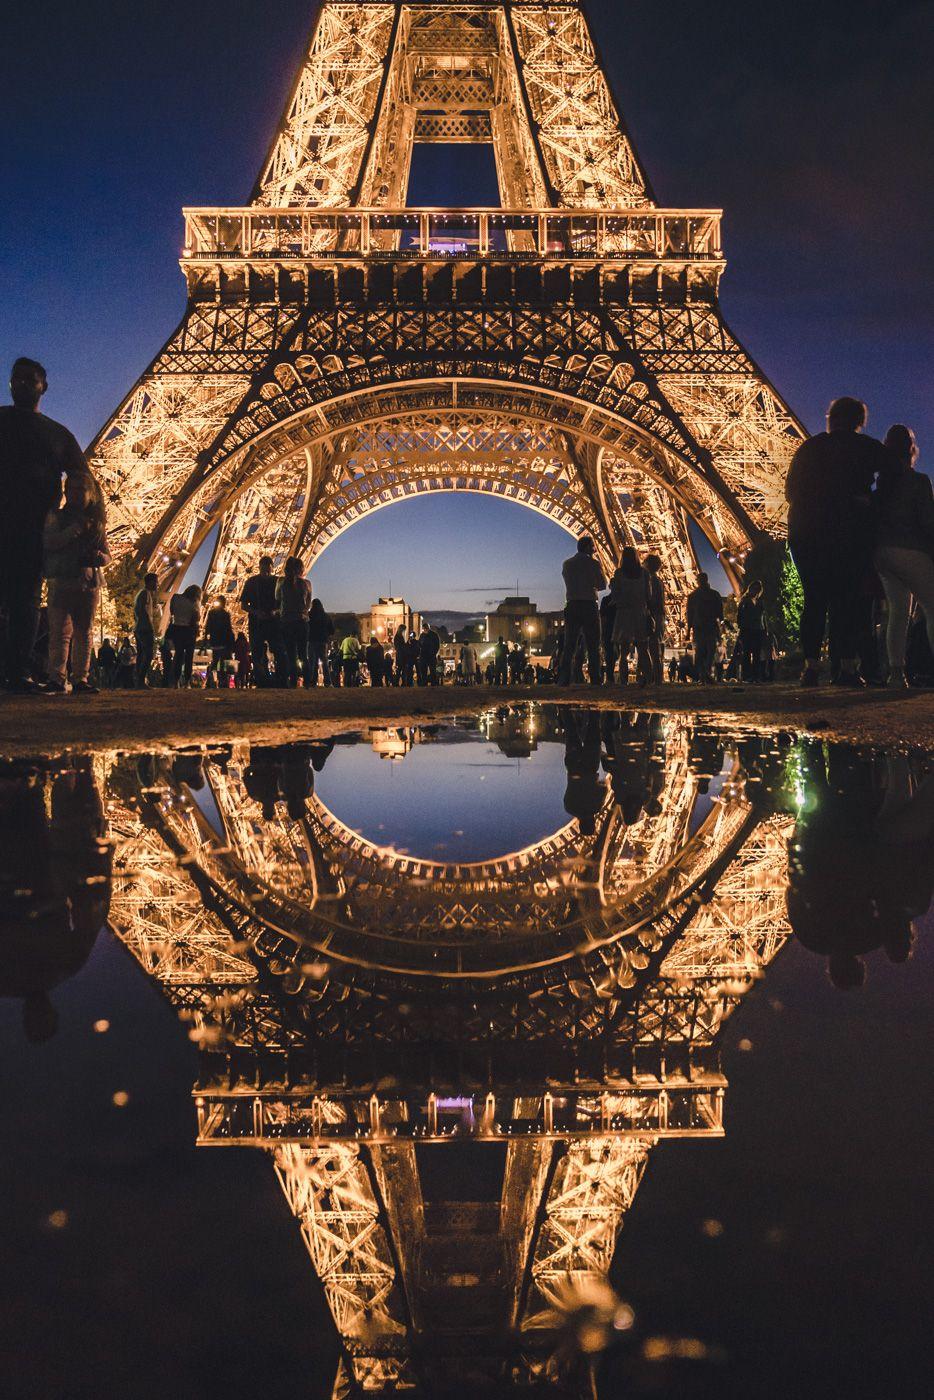 Paris eiffel tower Eiffel Tower wasn't designed by Gustave Eiffel, Paris, France #travel #paris #france #eiffeltower